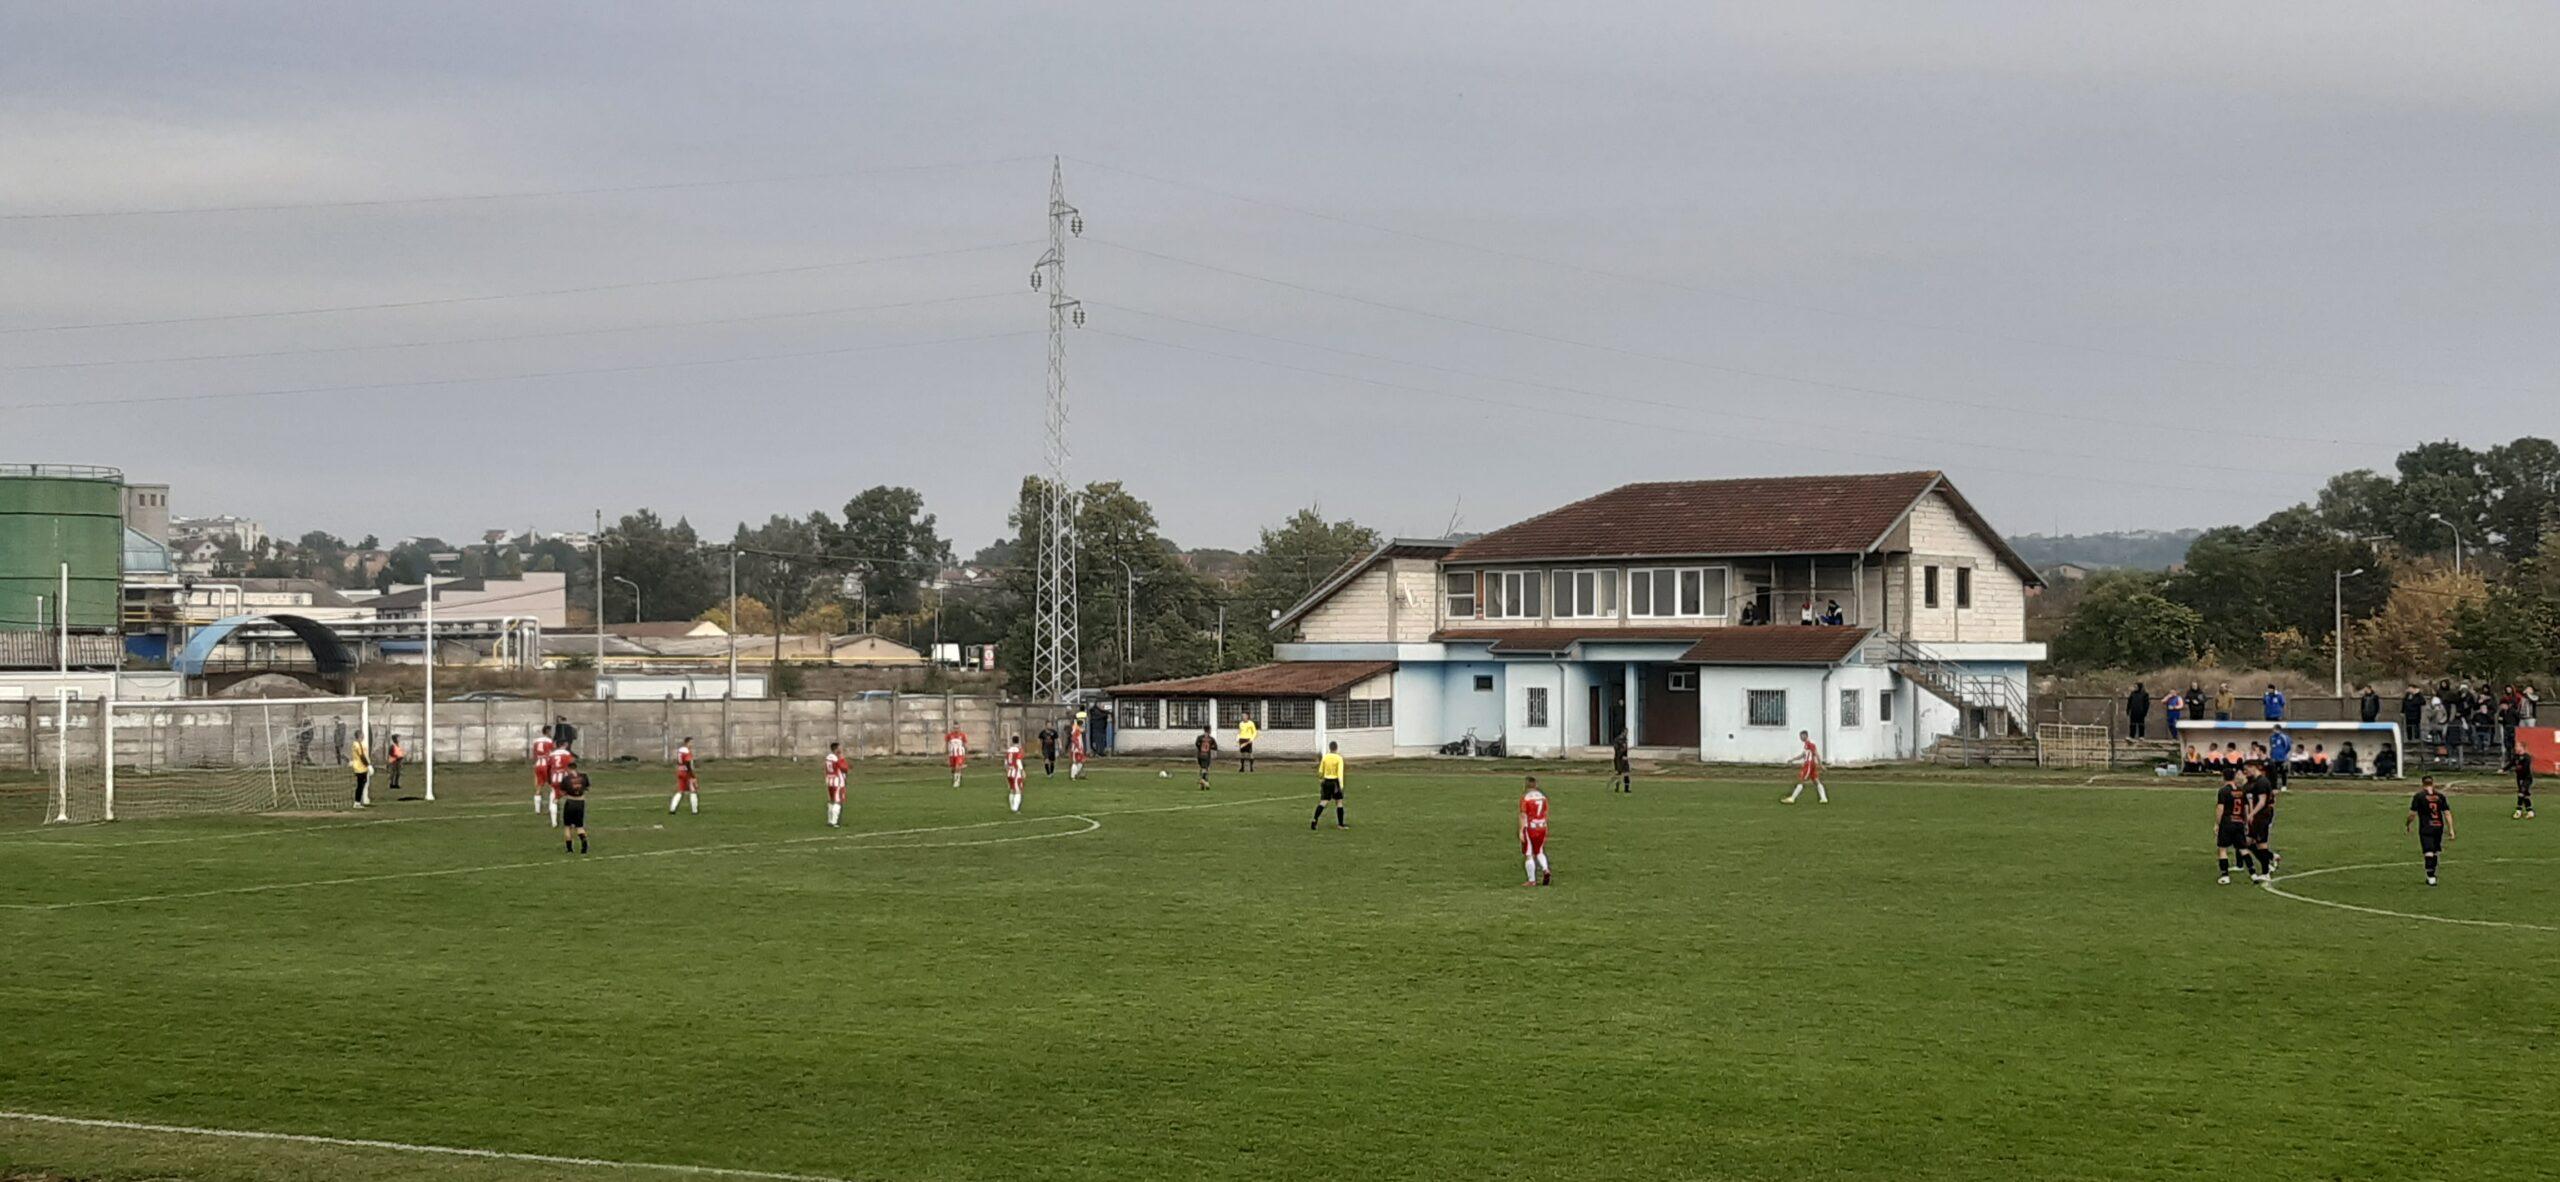 OFK Mladenovac – Zvezda (Konatice) 5:3 (2:3)